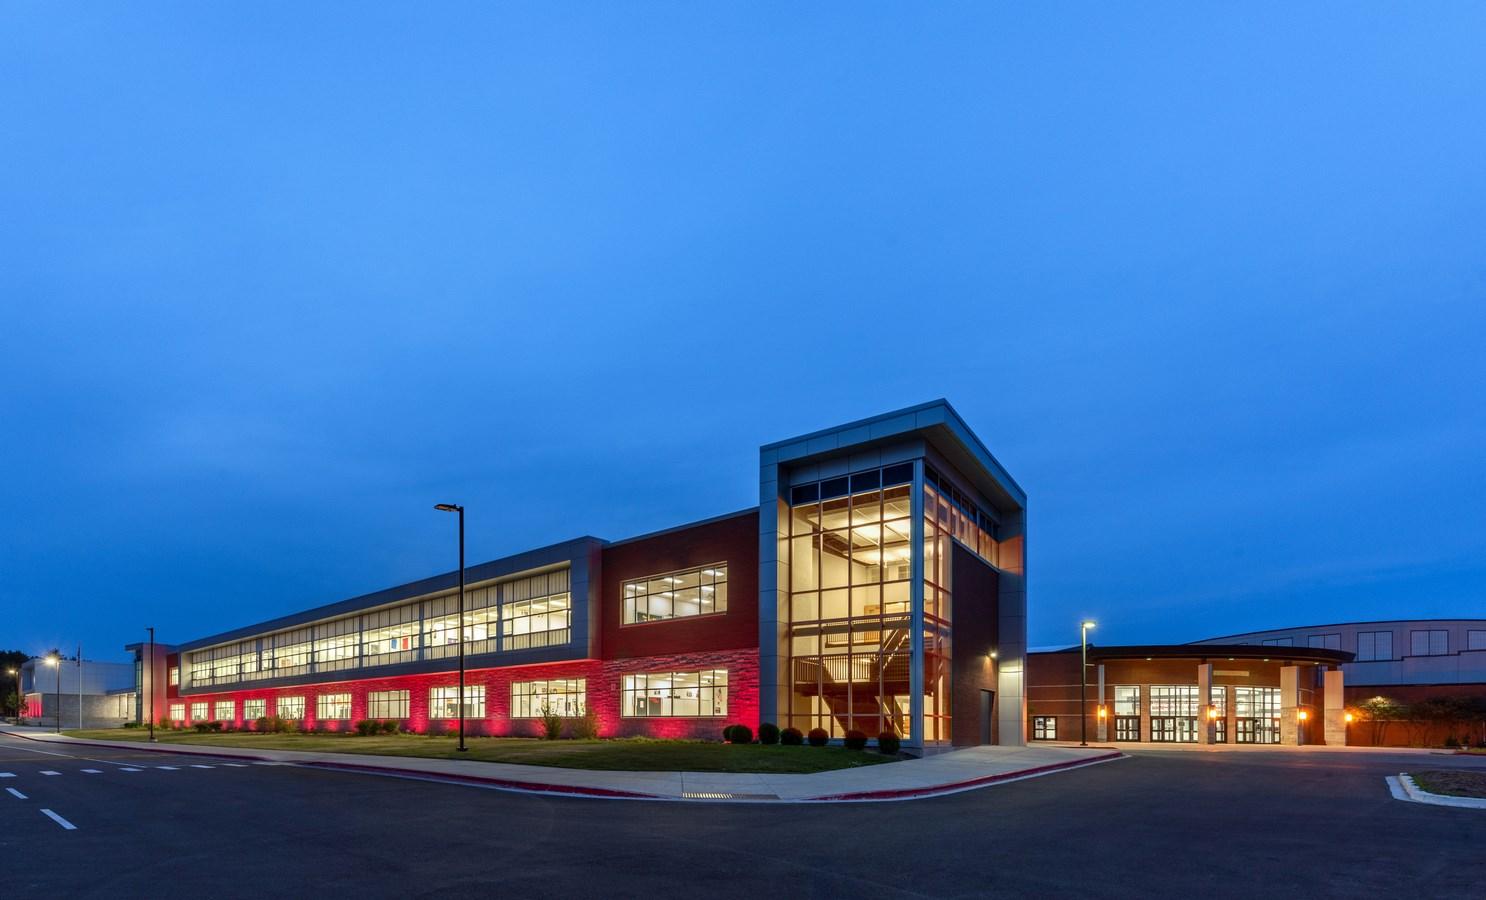 East Aurora High School Expansion by Cordogan Clark - sheet 1